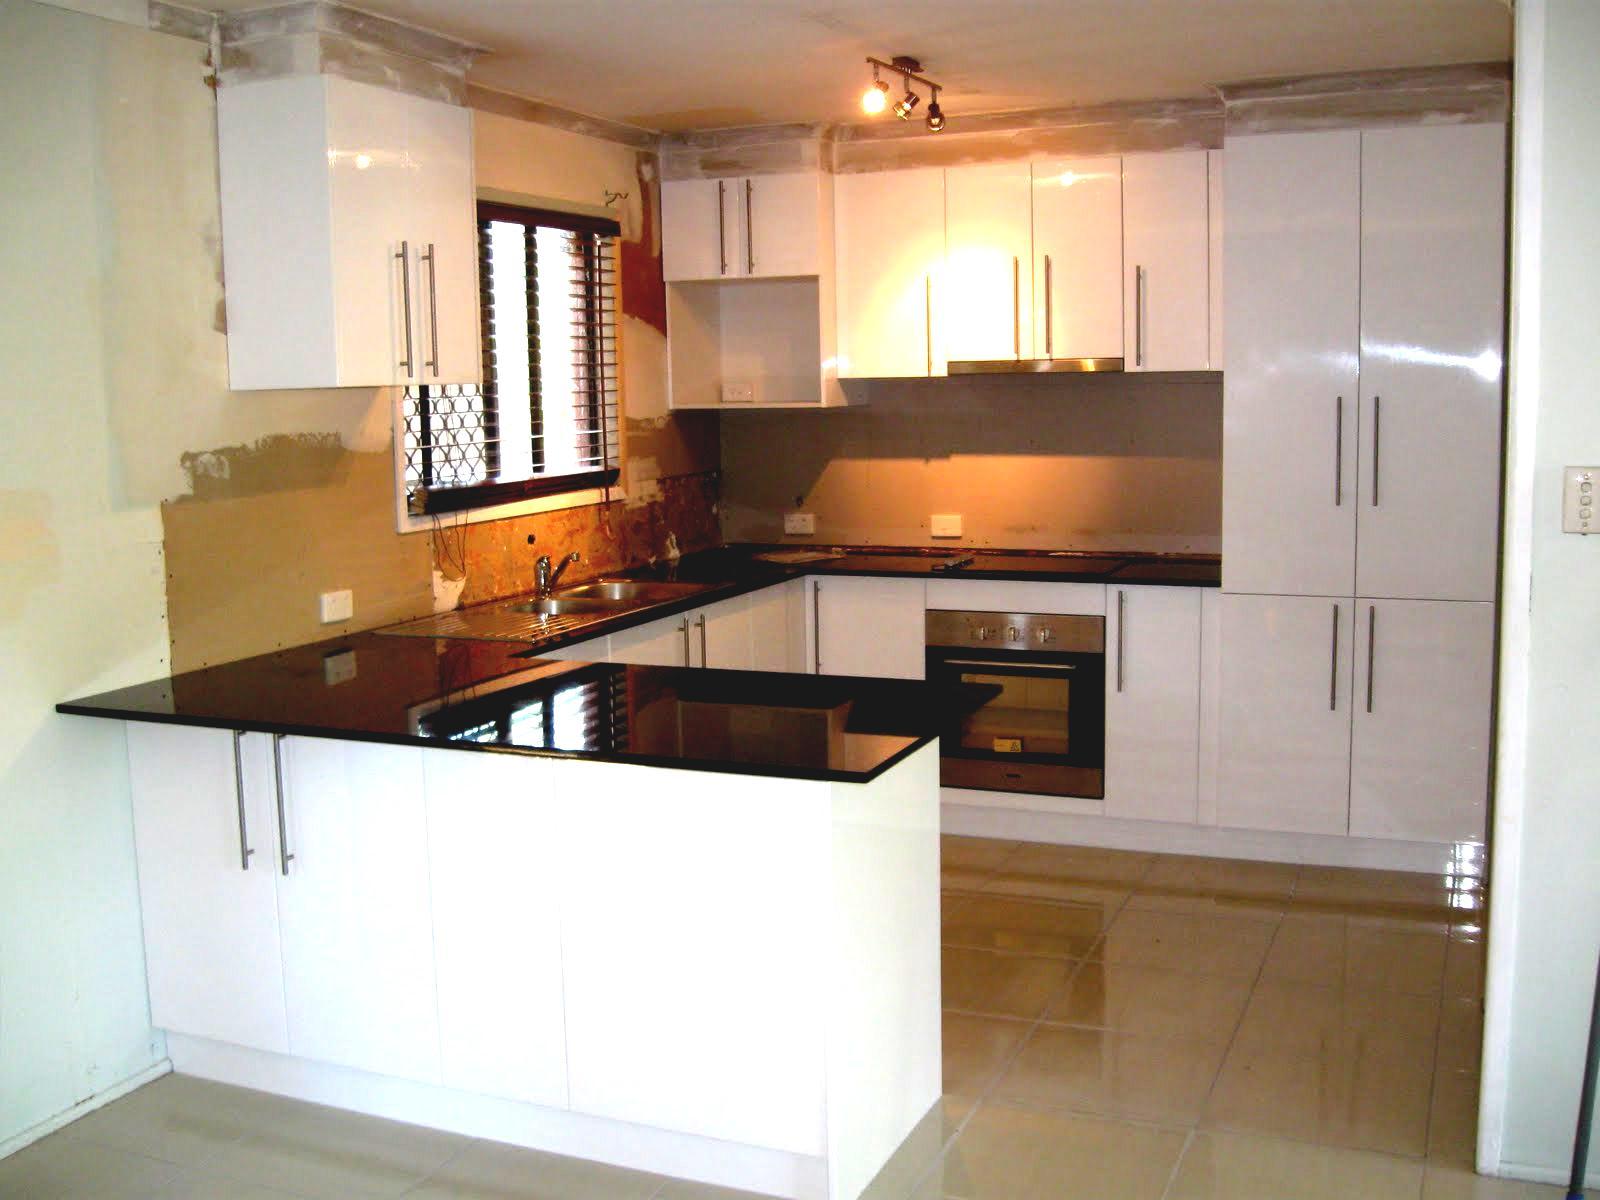 u shaped kitchen cabinets photo - 4